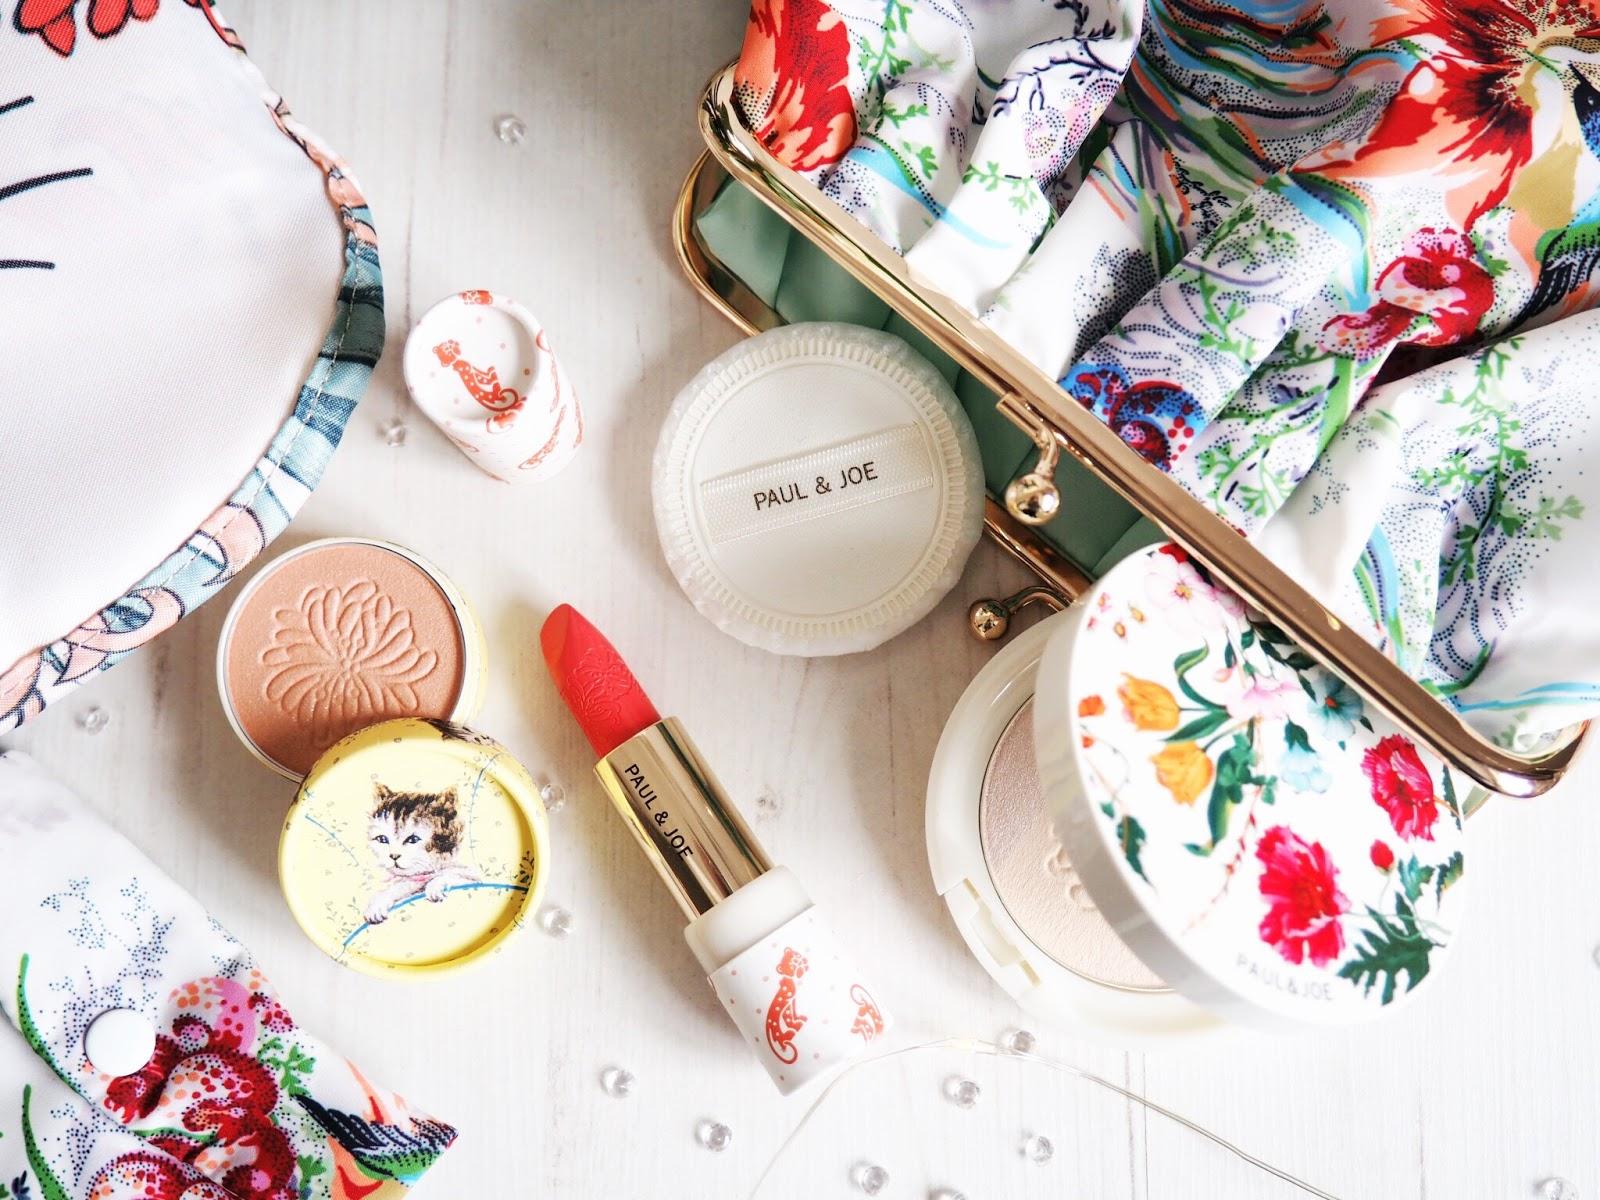 paul joe 20th fashion anniversary make up collection lady writes. Black Bedroom Furniture Sets. Home Design Ideas